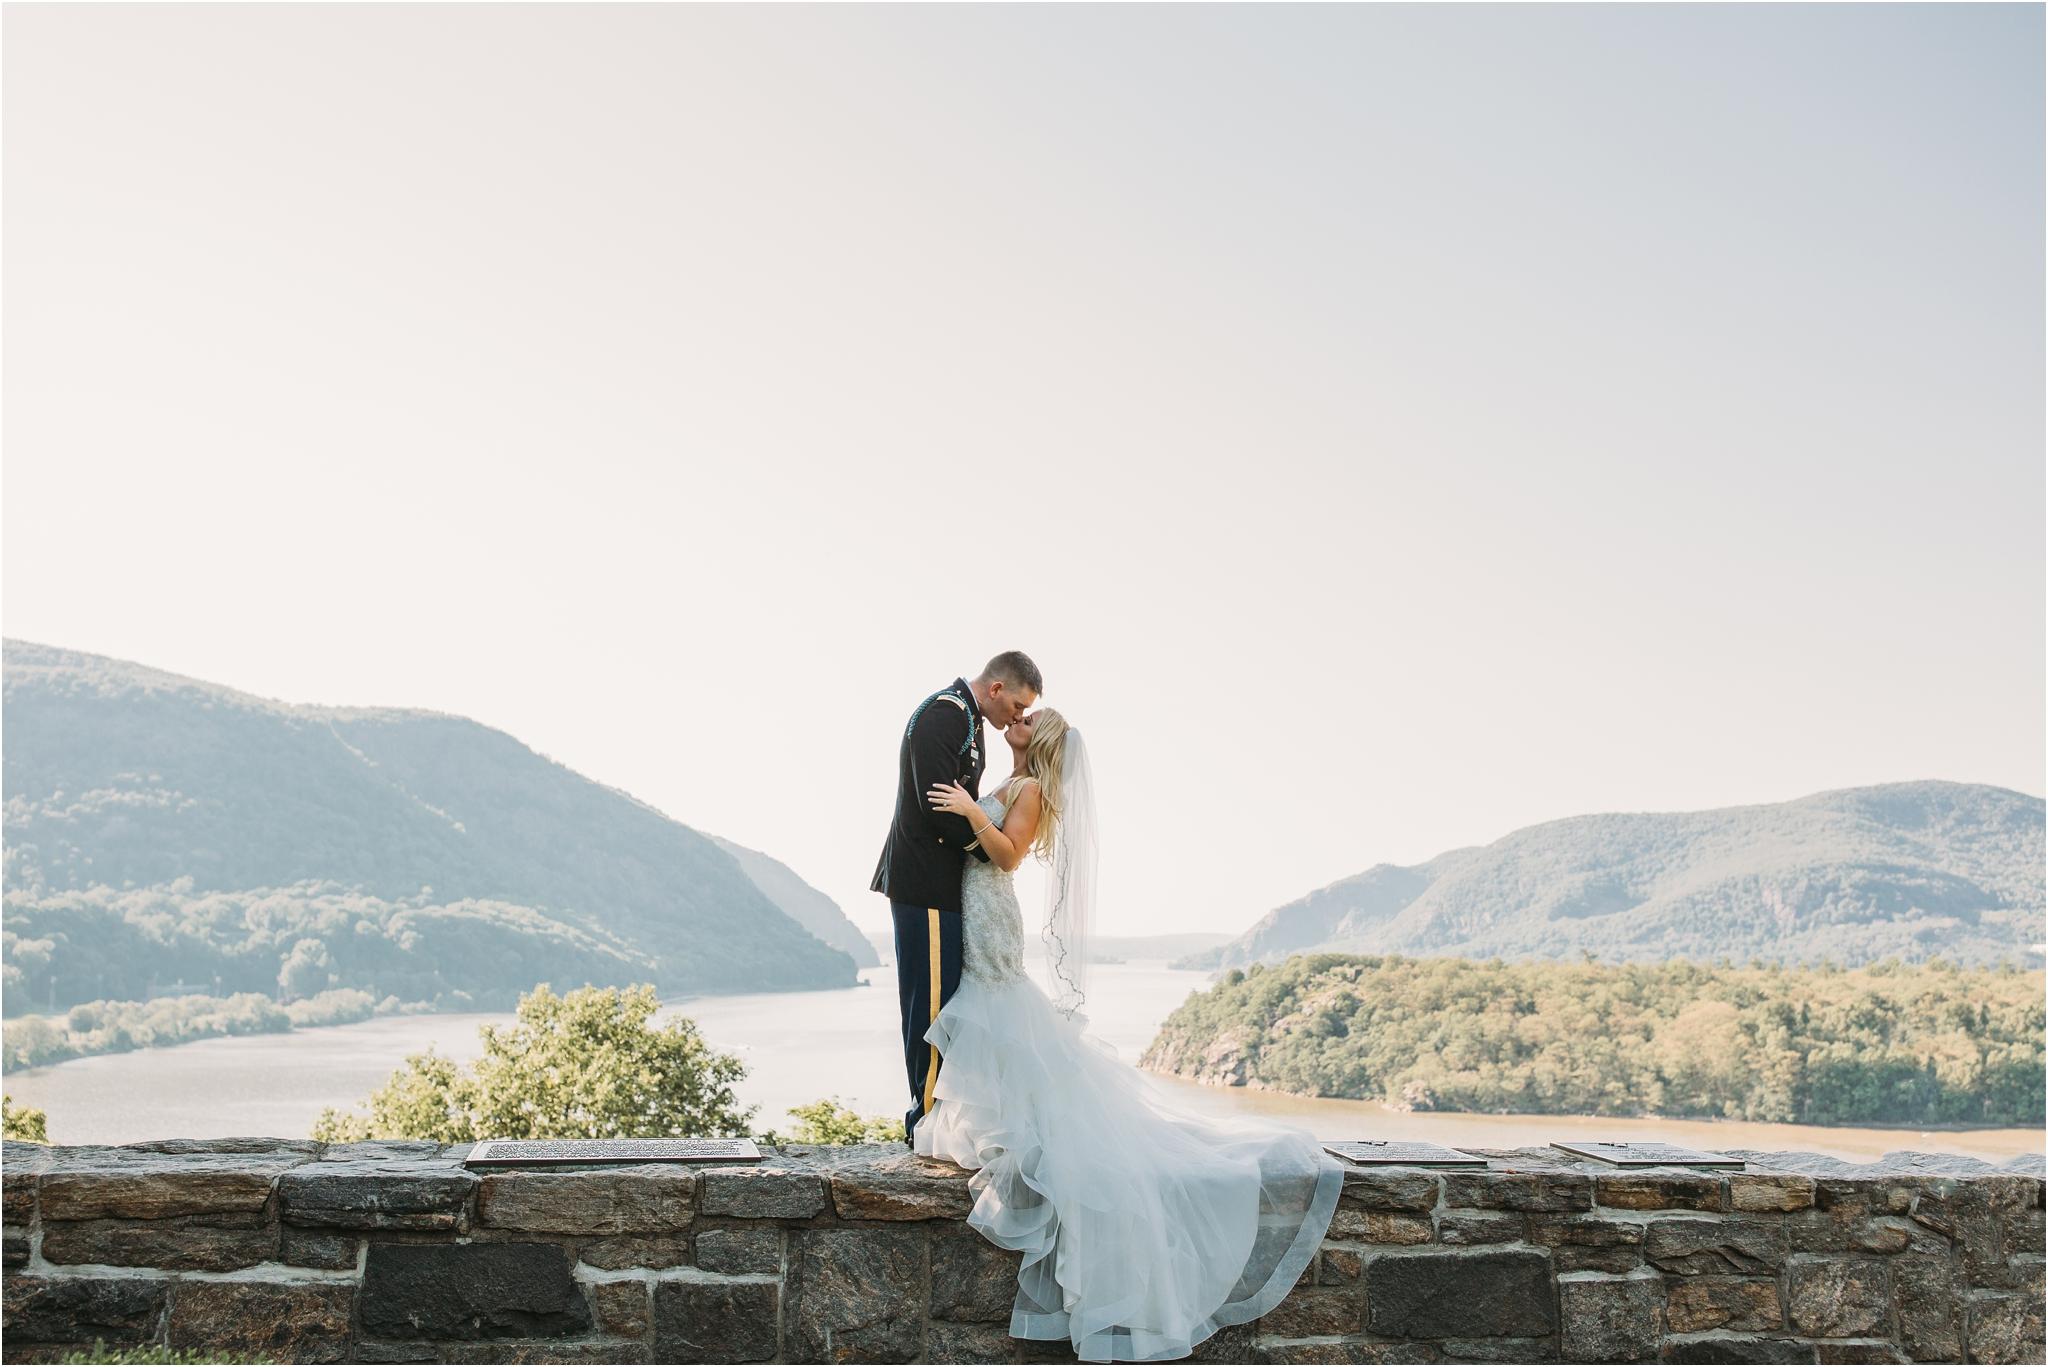 West-Point-NY-Wedding_0427.jpg